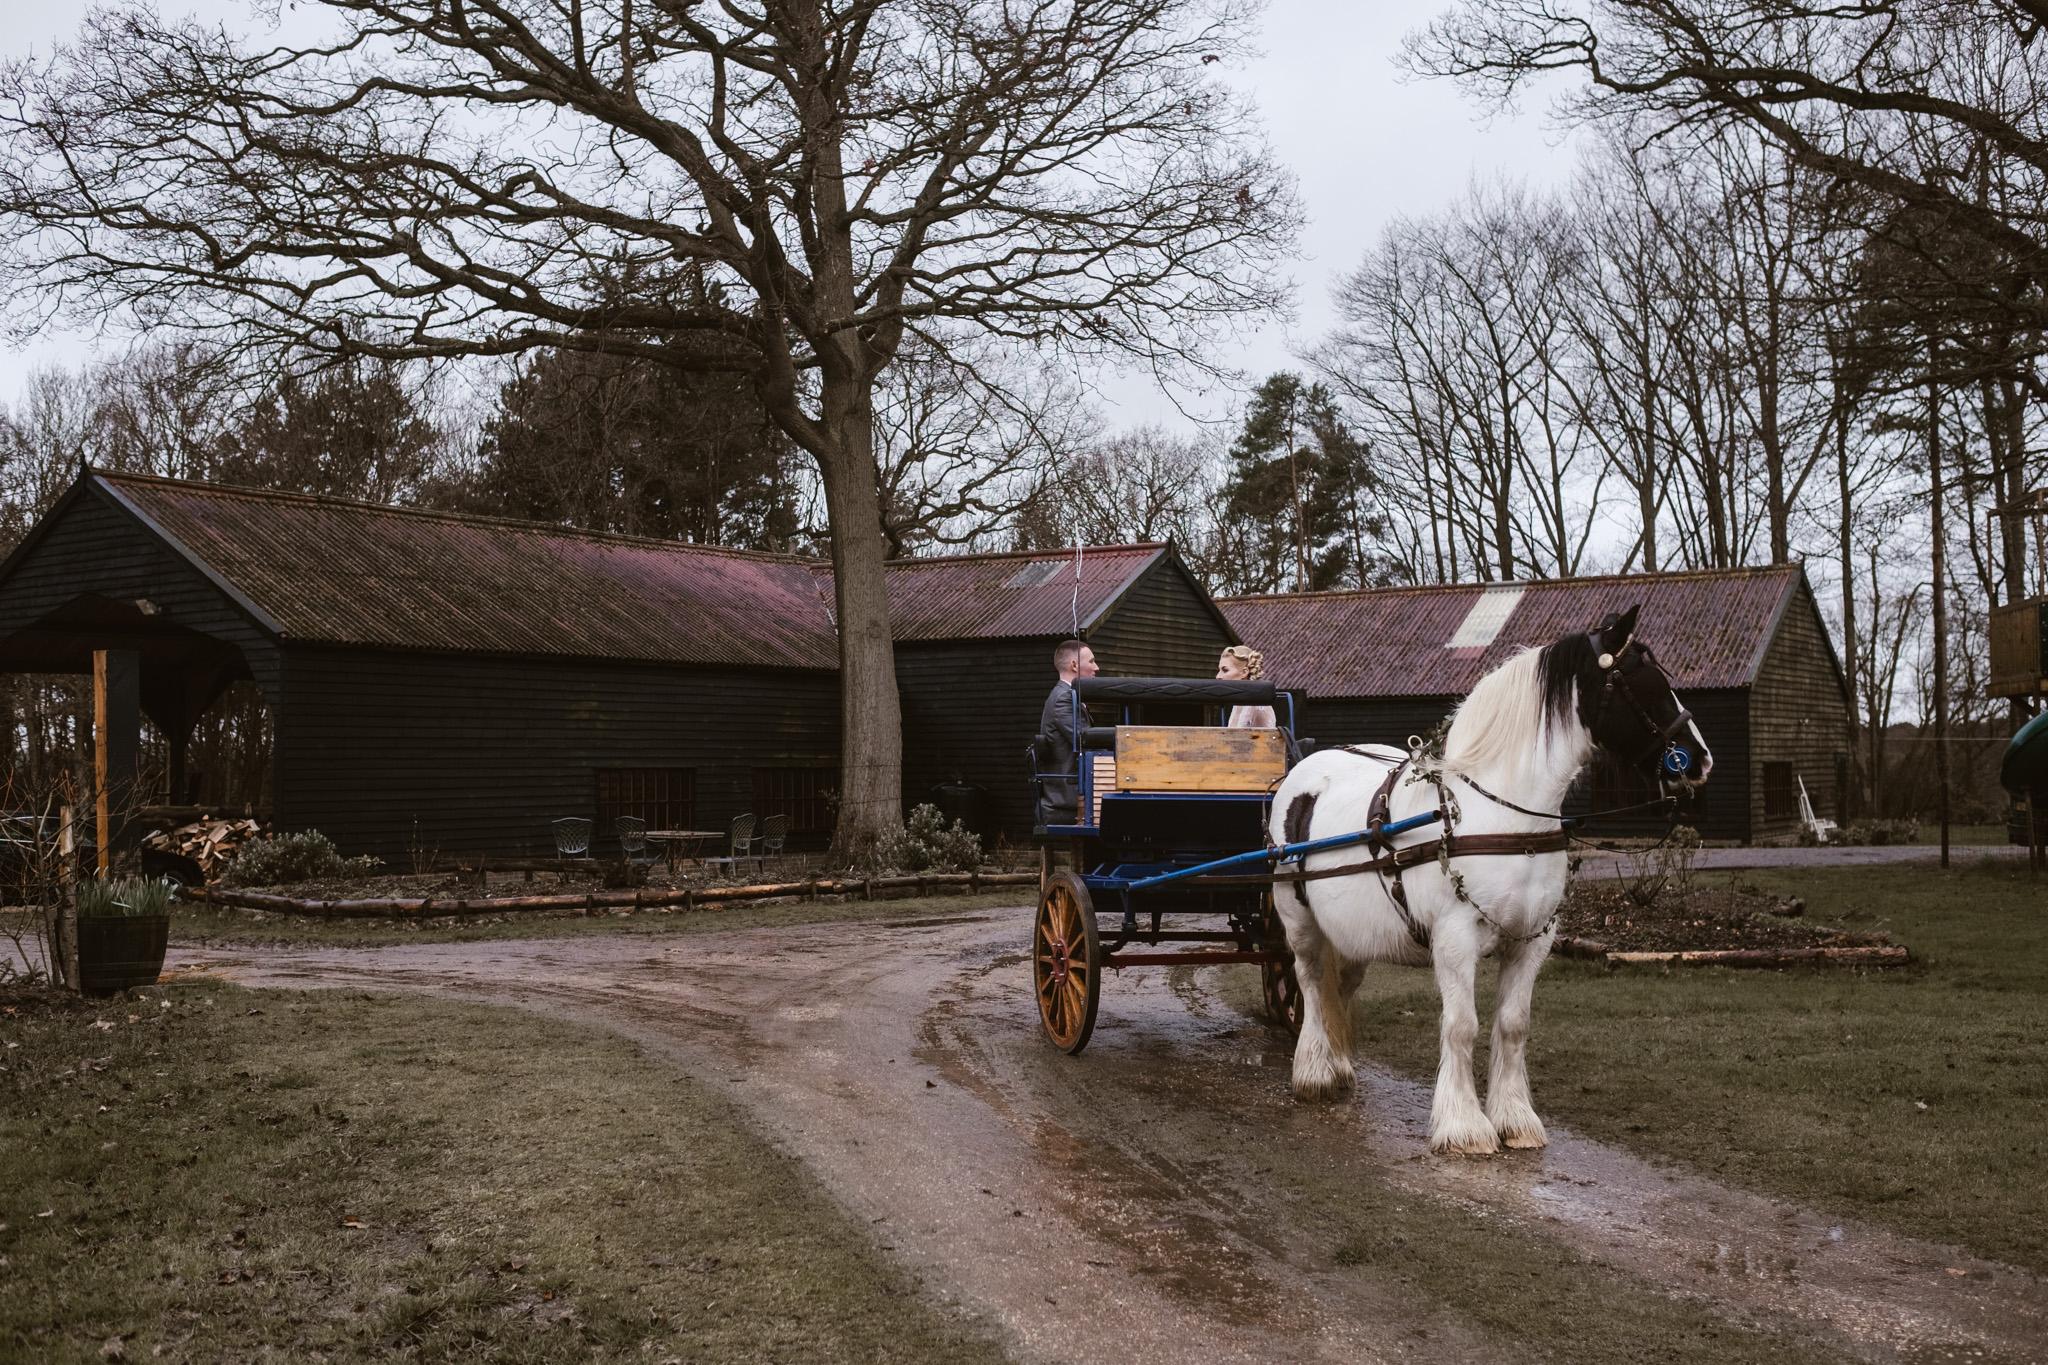 Captains-Wood-Barn-Alterative-Rustic-Vintage-Essex-Wedding-Suffolk-Grace-Elizabeth-5.jpg